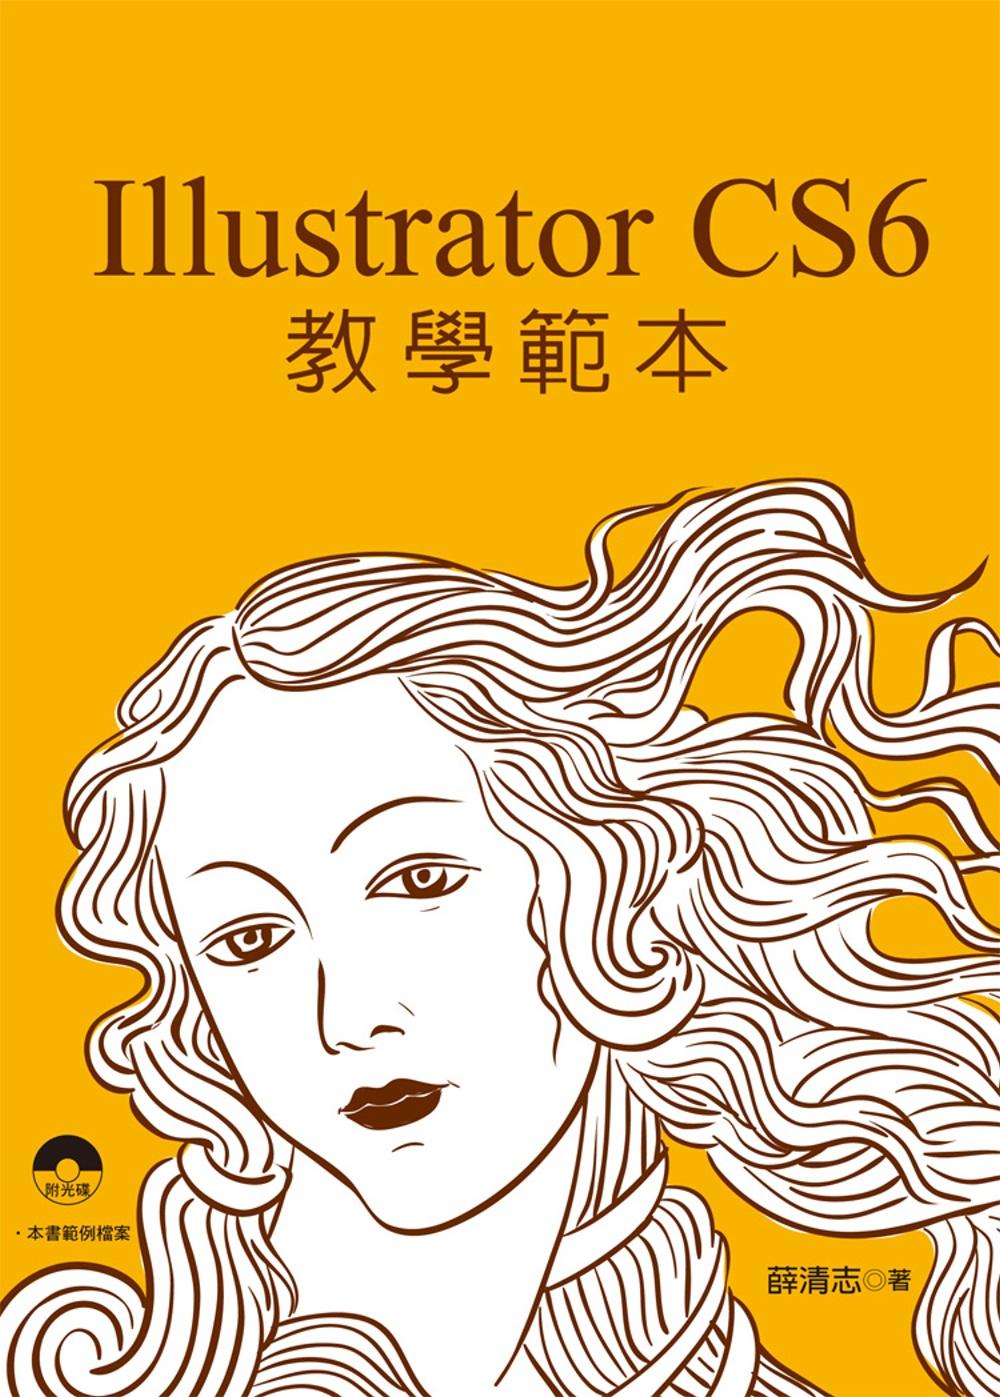 Illustrator CS6 教學範本(附光碟)